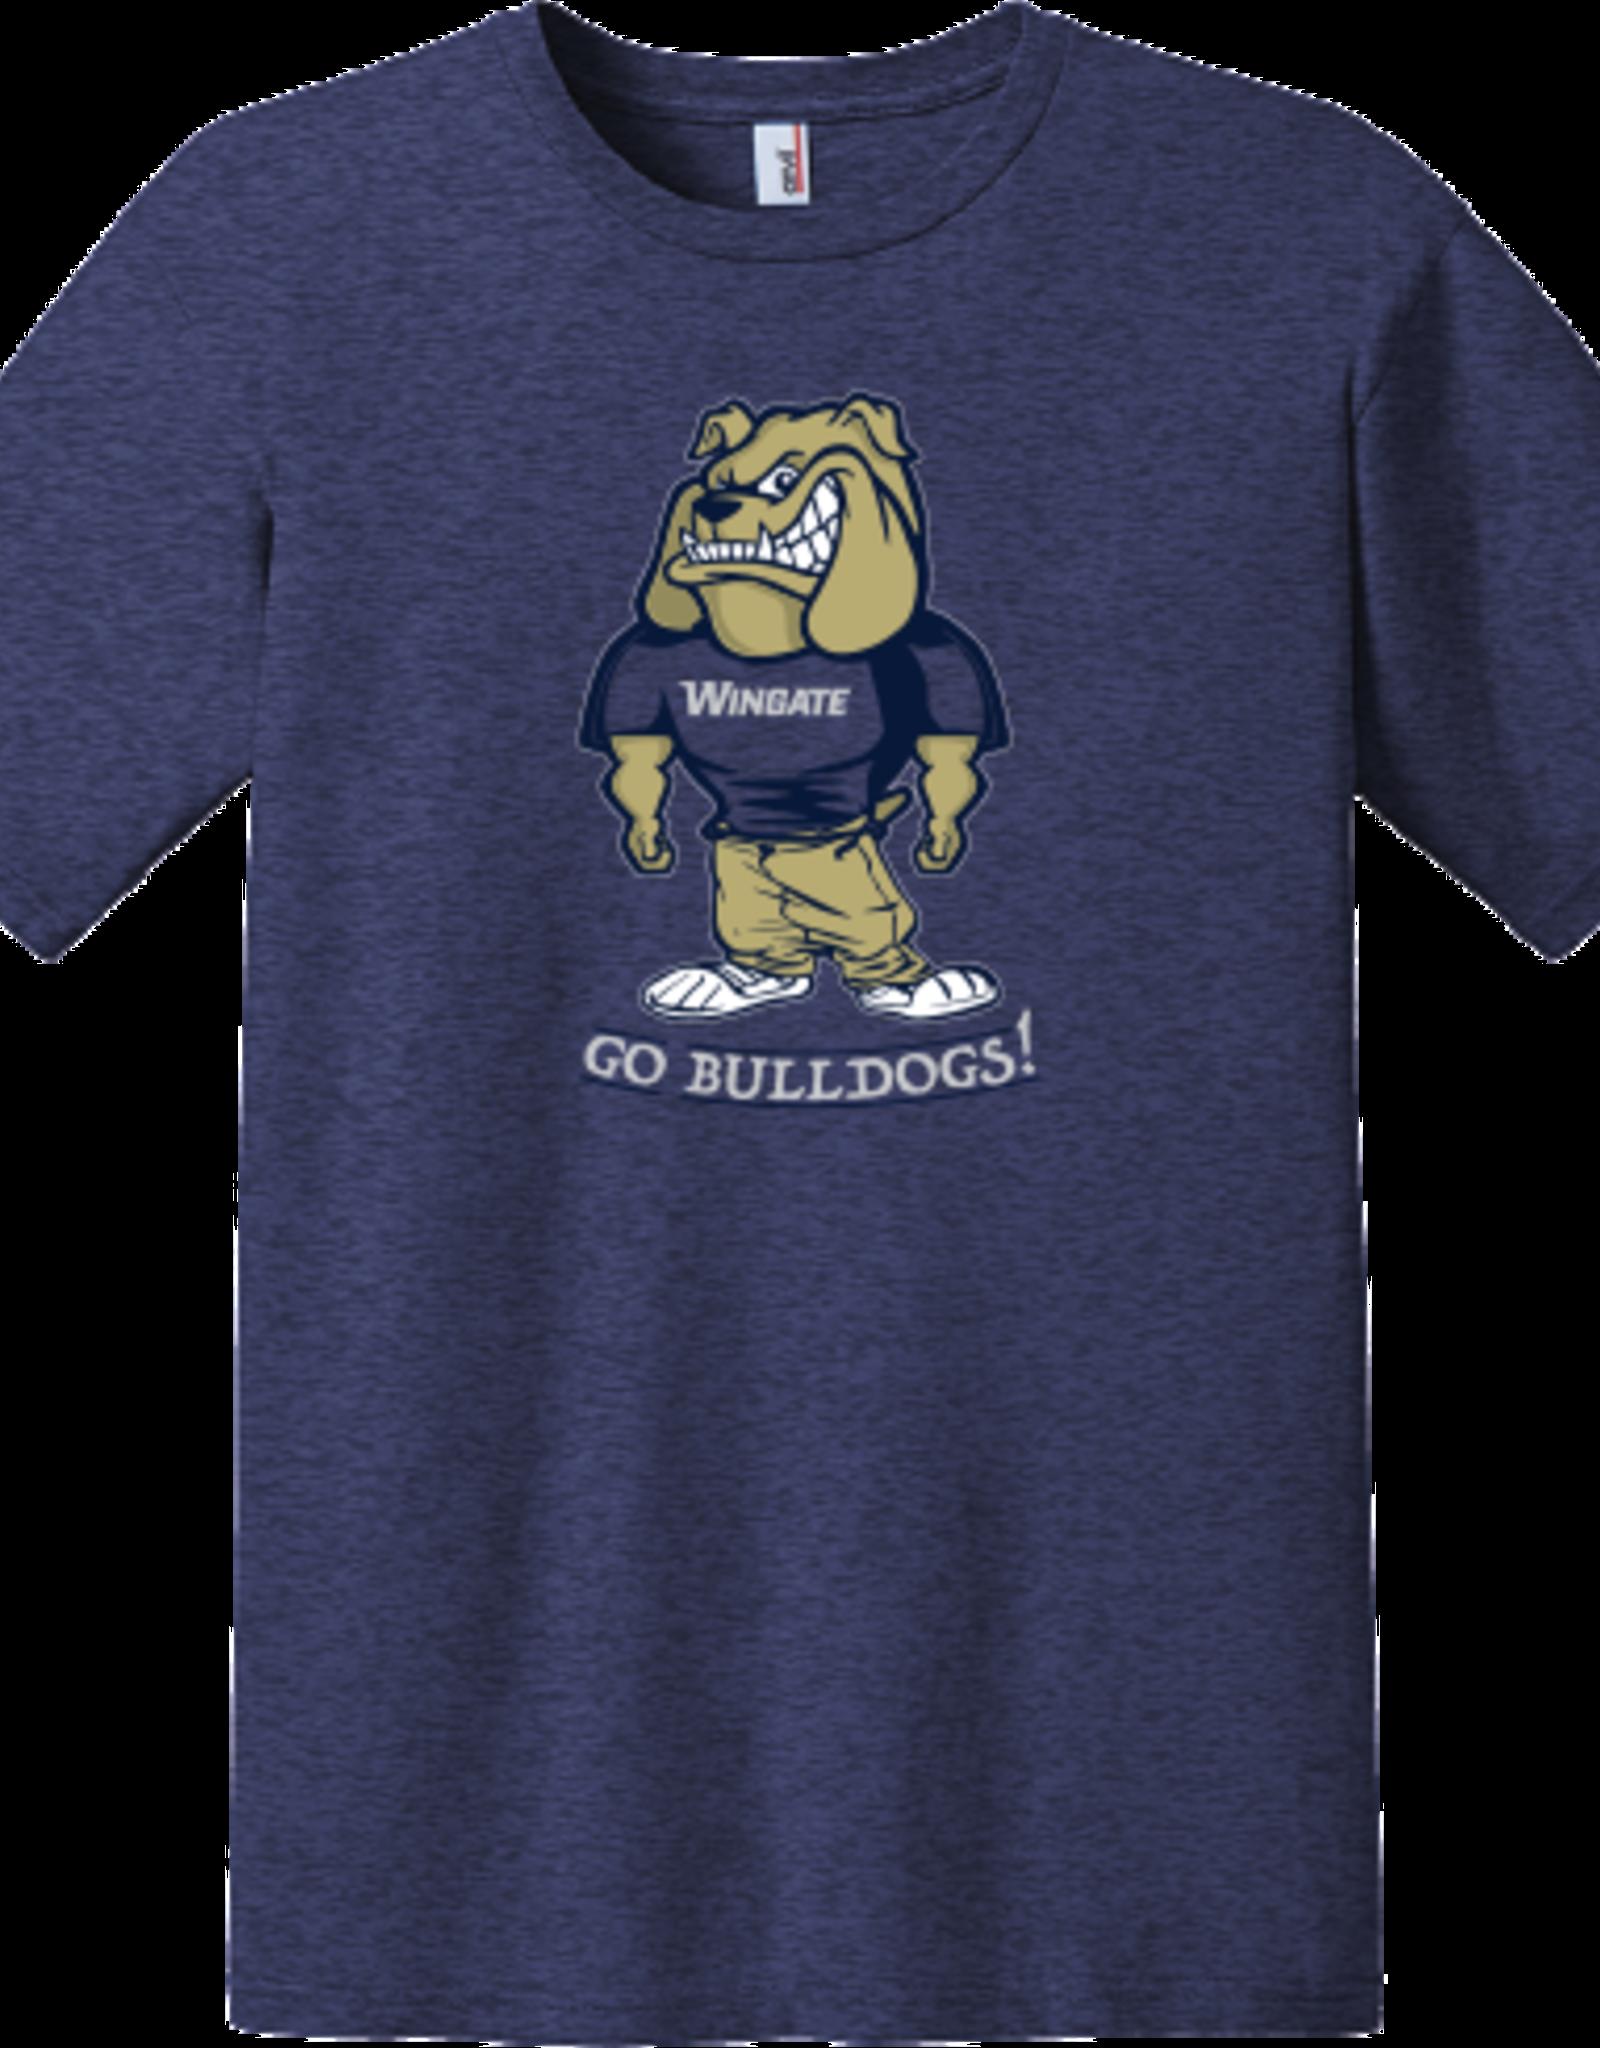 Anvil Gildan Lightweight Cartoon Mascot Wingate Bulldogs Blue SS Tee